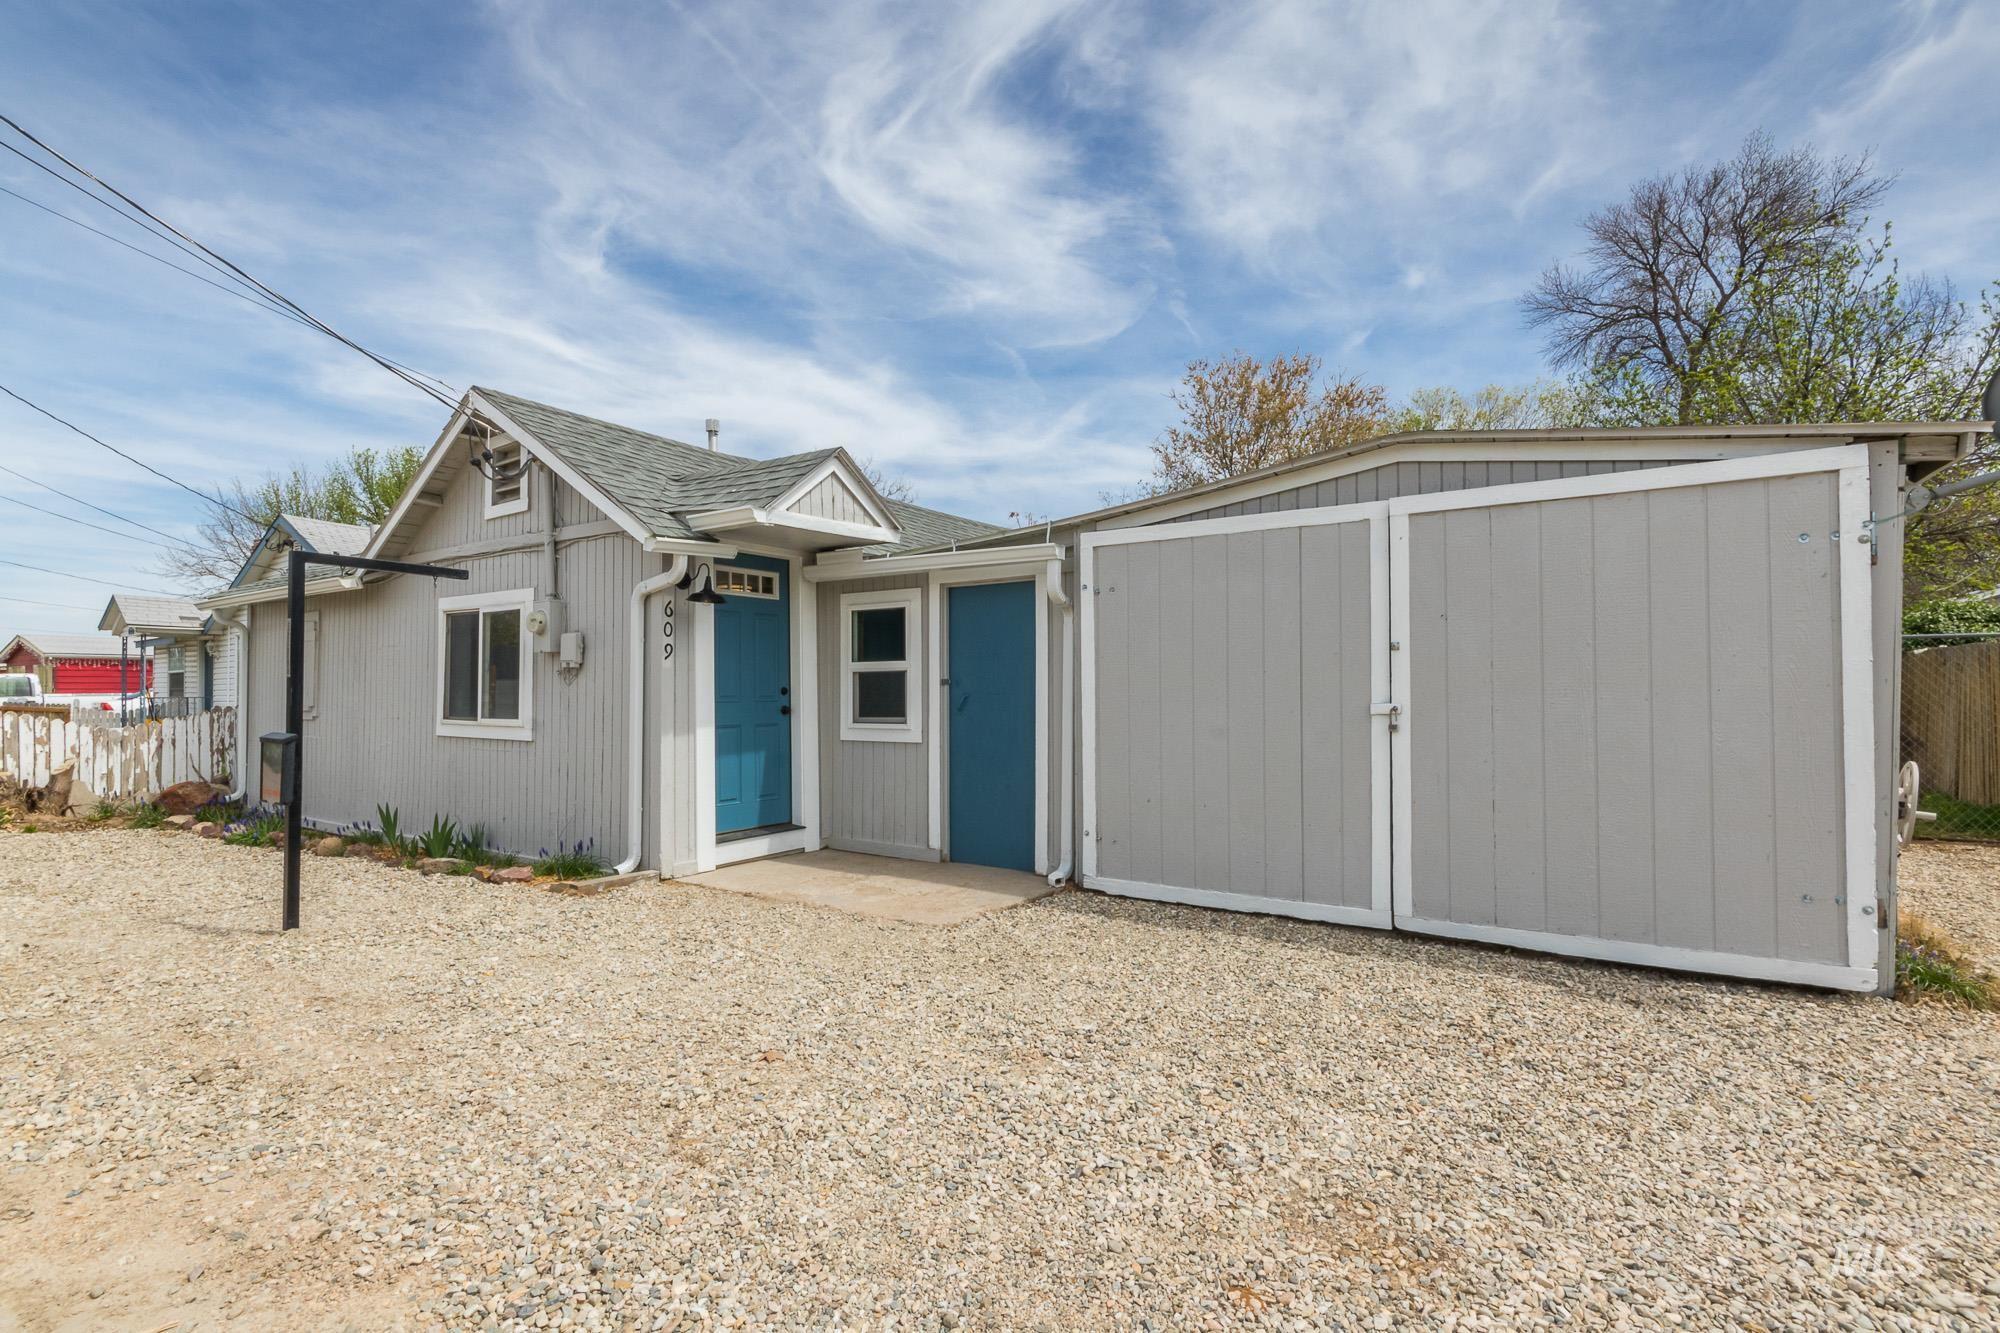 609 Hubbard Property Photo - Nampa, ID real estate listing